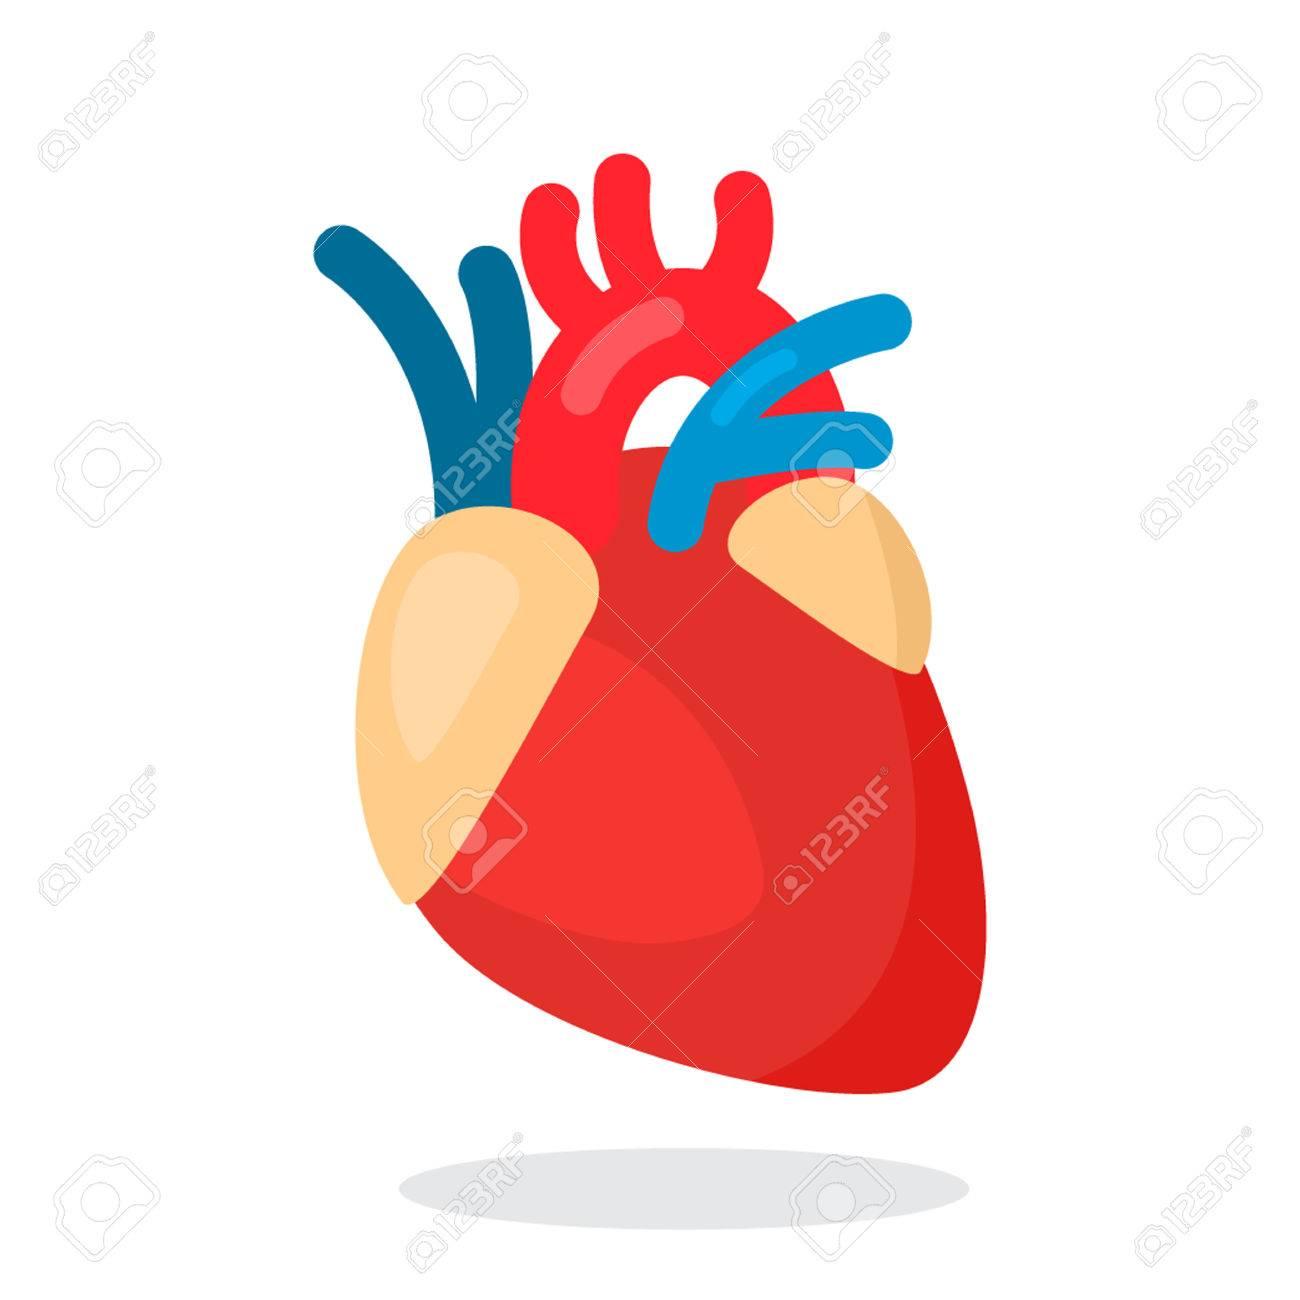 human heart anatomy heart medical science vector illustration rh 123rf com Medical Heart Cartoon Medical Heart Drawing